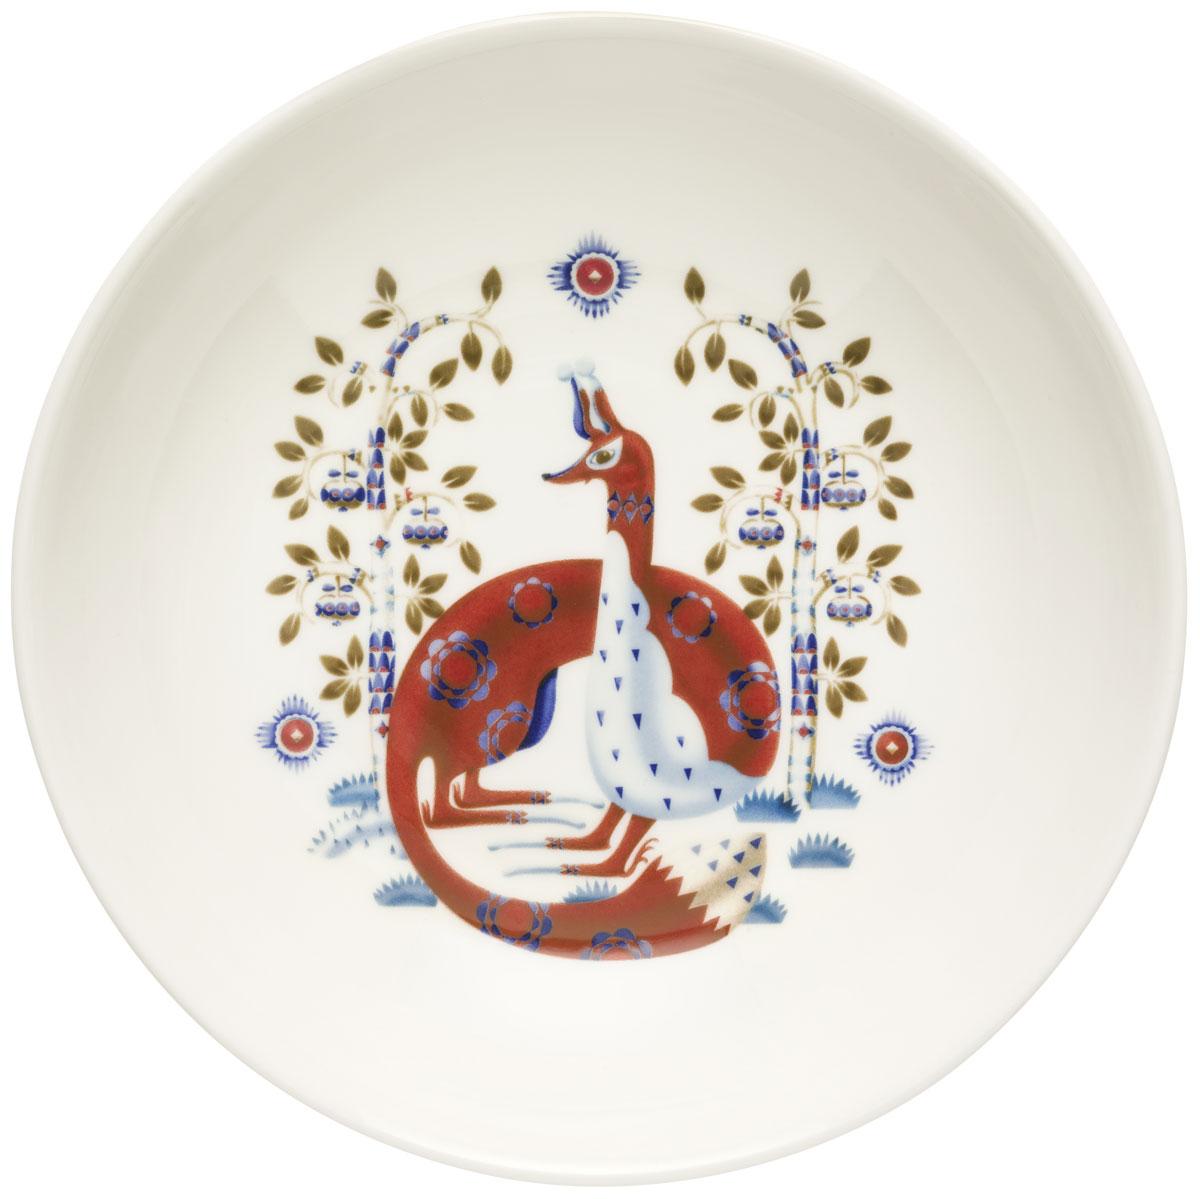 Тарелка глубокая Iittala Taika, цвет: белый, диаметр 22 см1011653